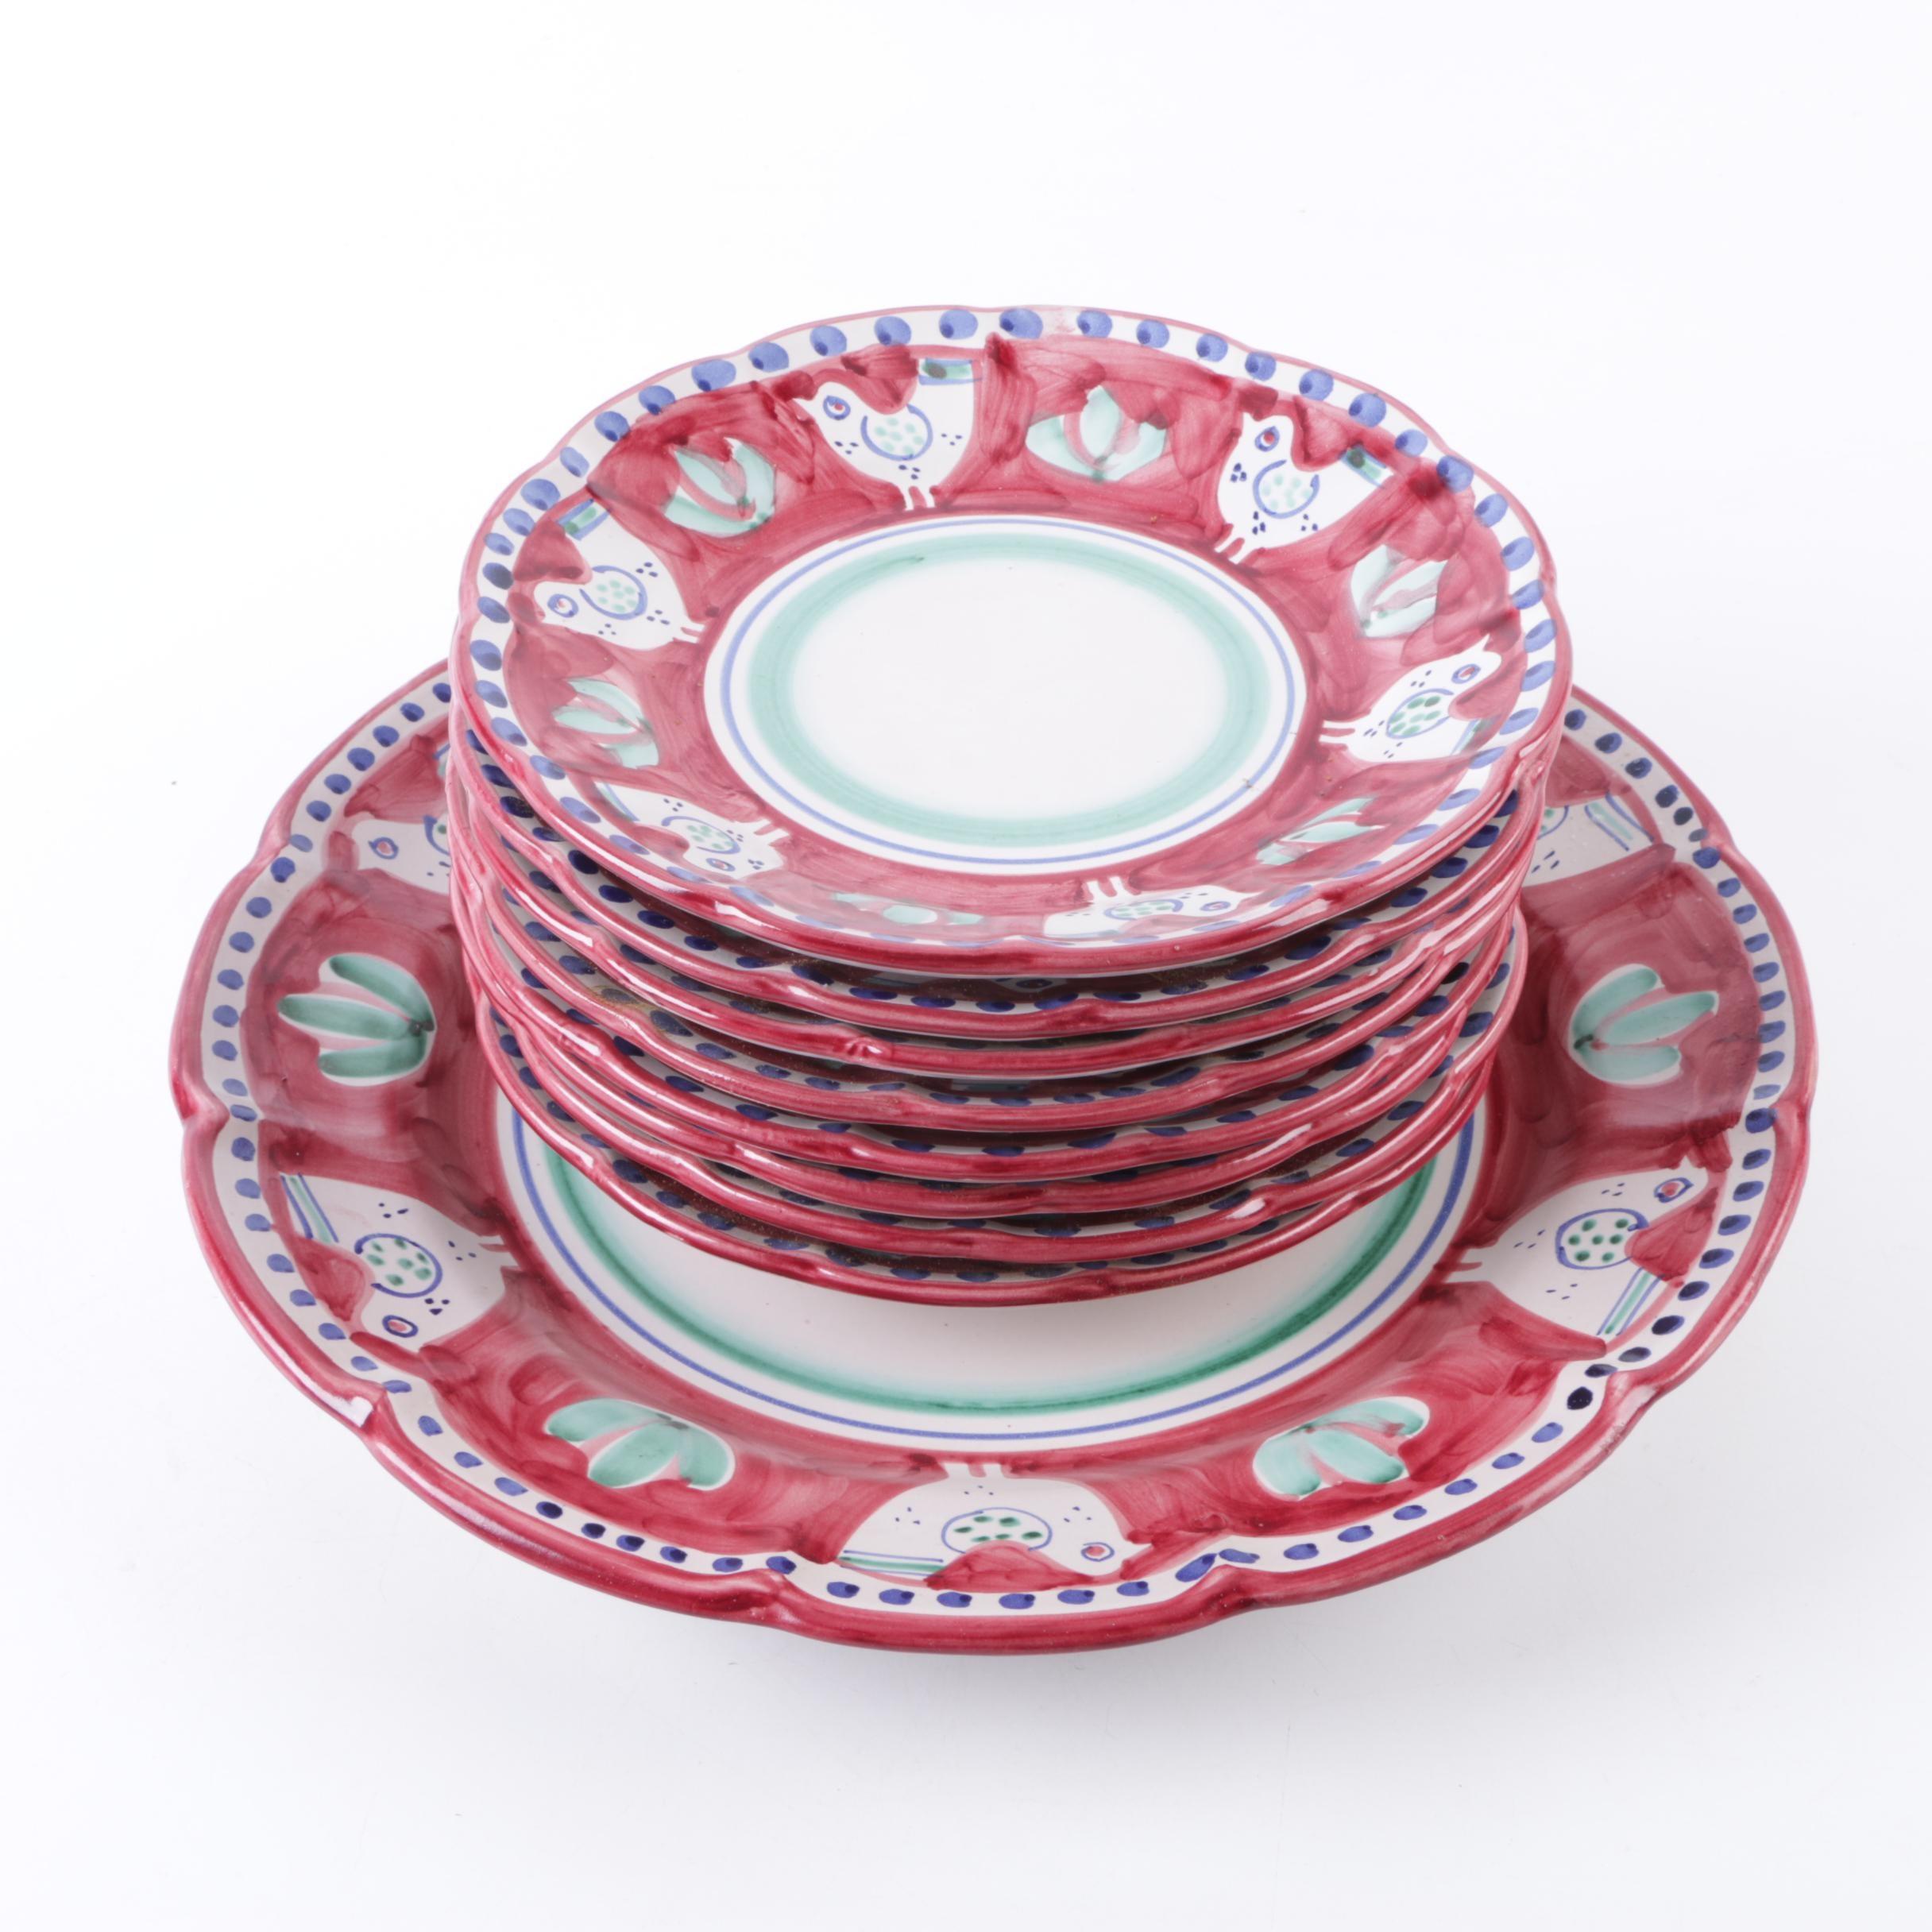 Italian Hand-painted Ceramic Tableware